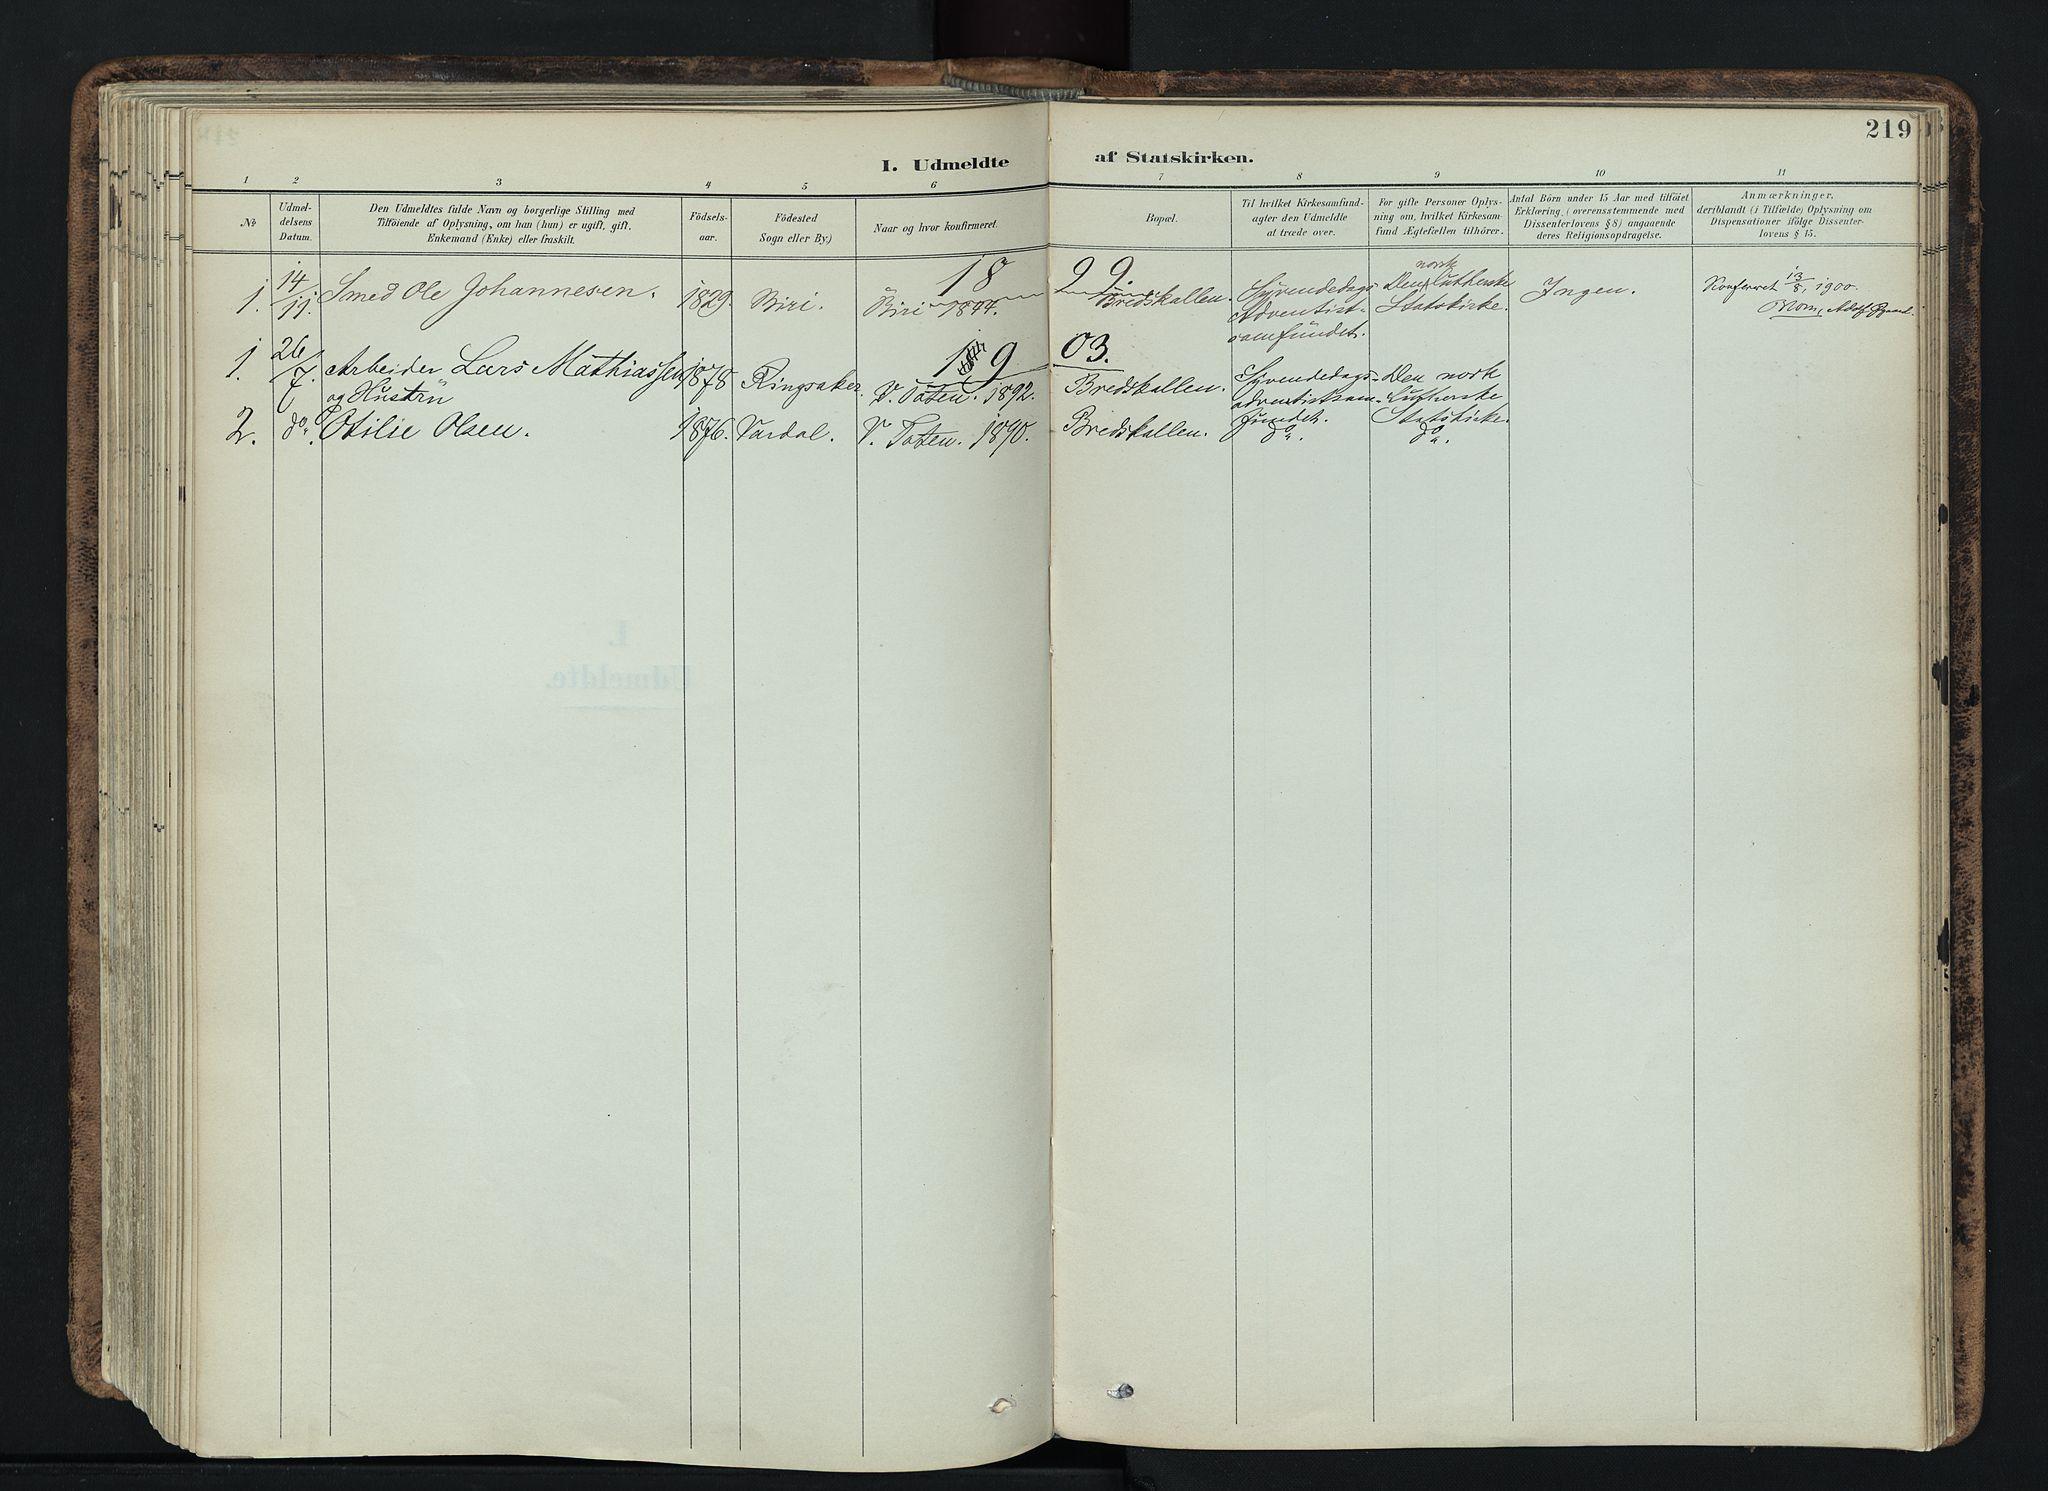 SAH, Vardal prestekontor, H/Ha/Haa/L0019: Ministerialbok nr. 19, 1893-1907, s. 219